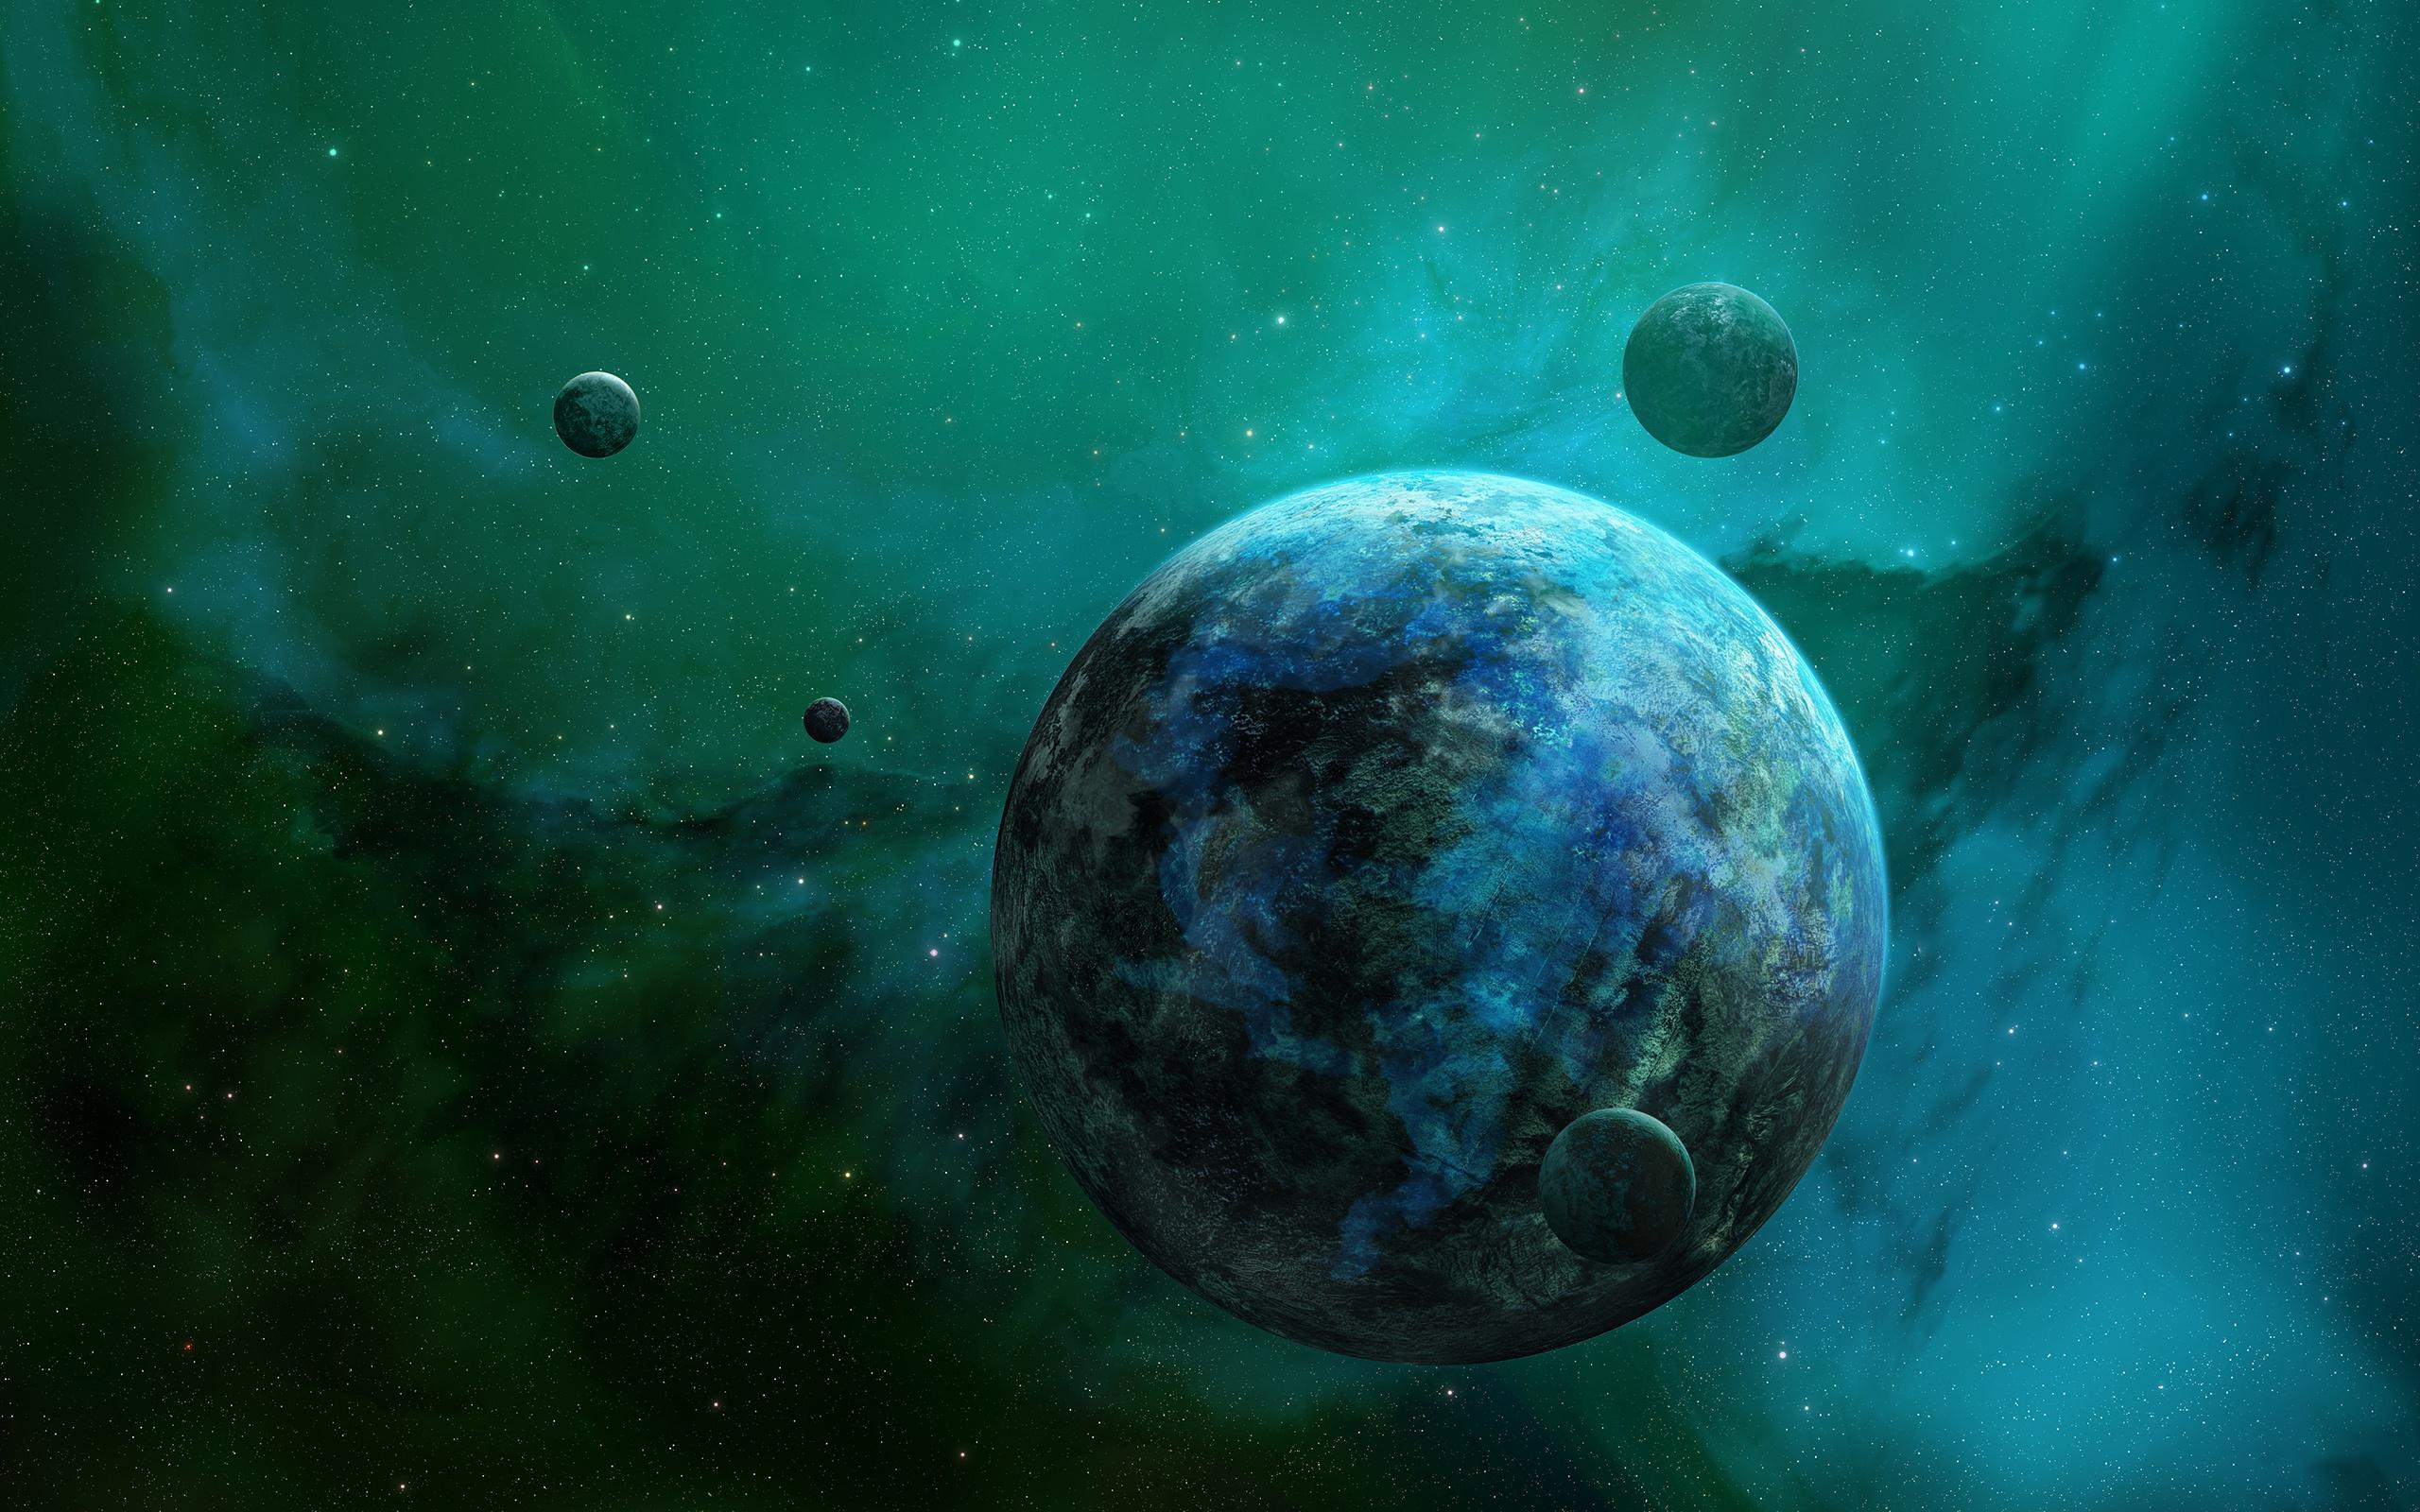 General 2560x1600 planet space art space digital art JoeyJazz